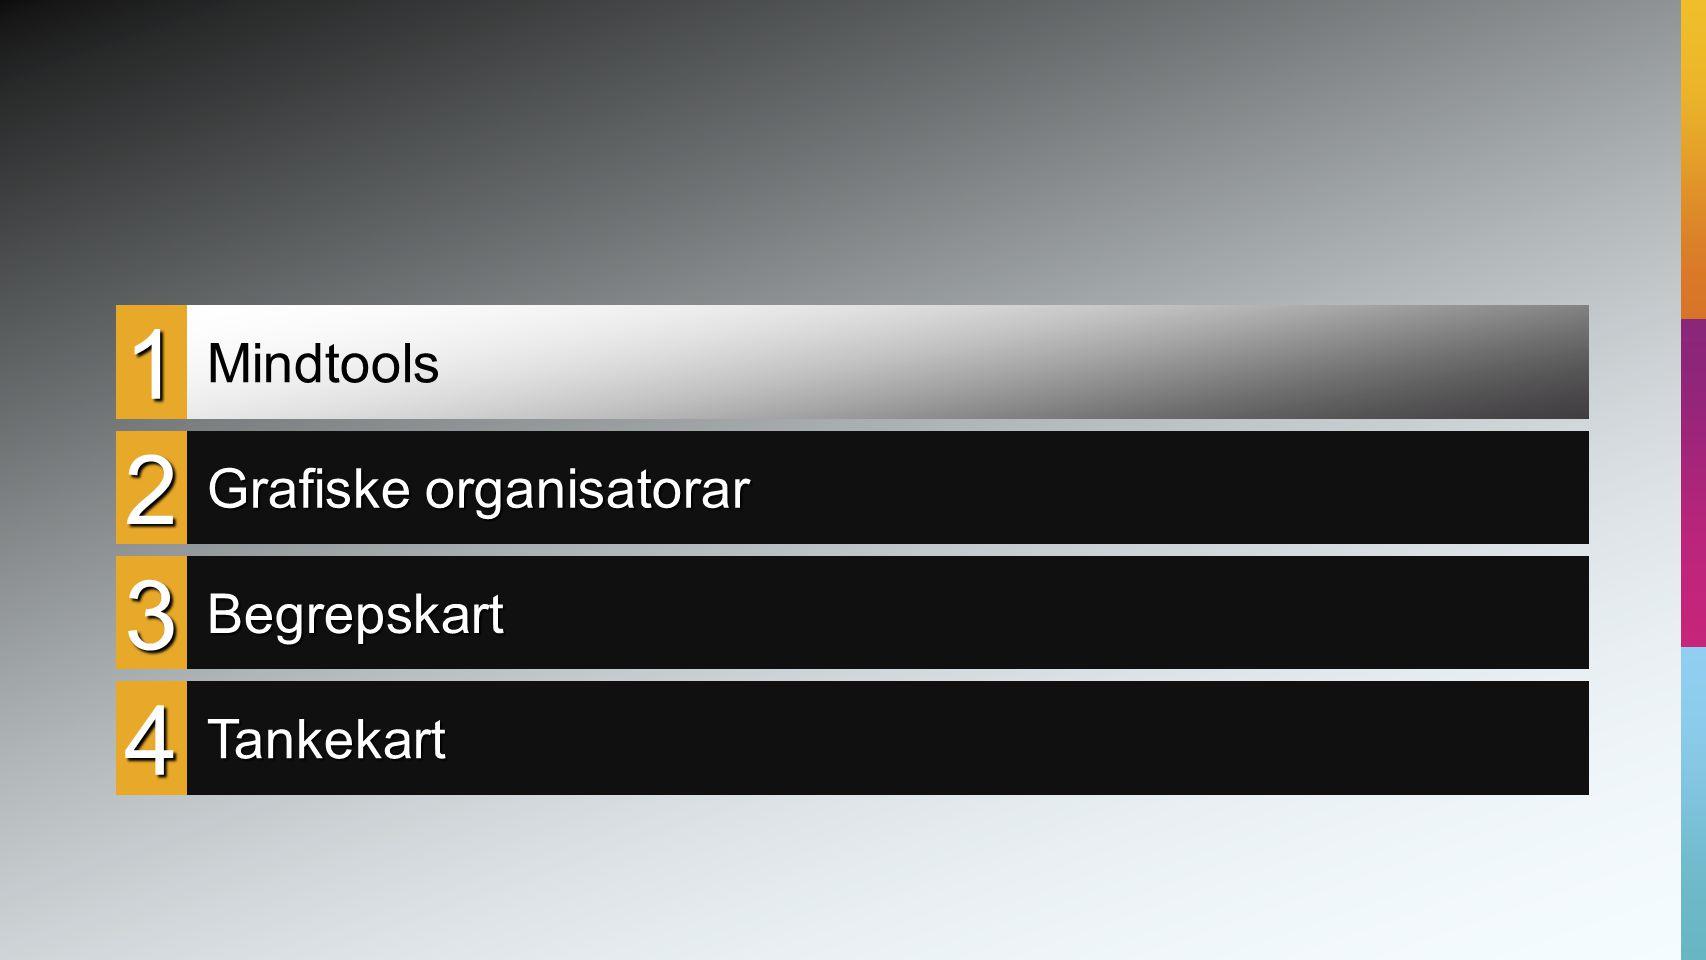 1 2 3 4 Mindtools Grafiske organisatorar Begrepskart Tankekart